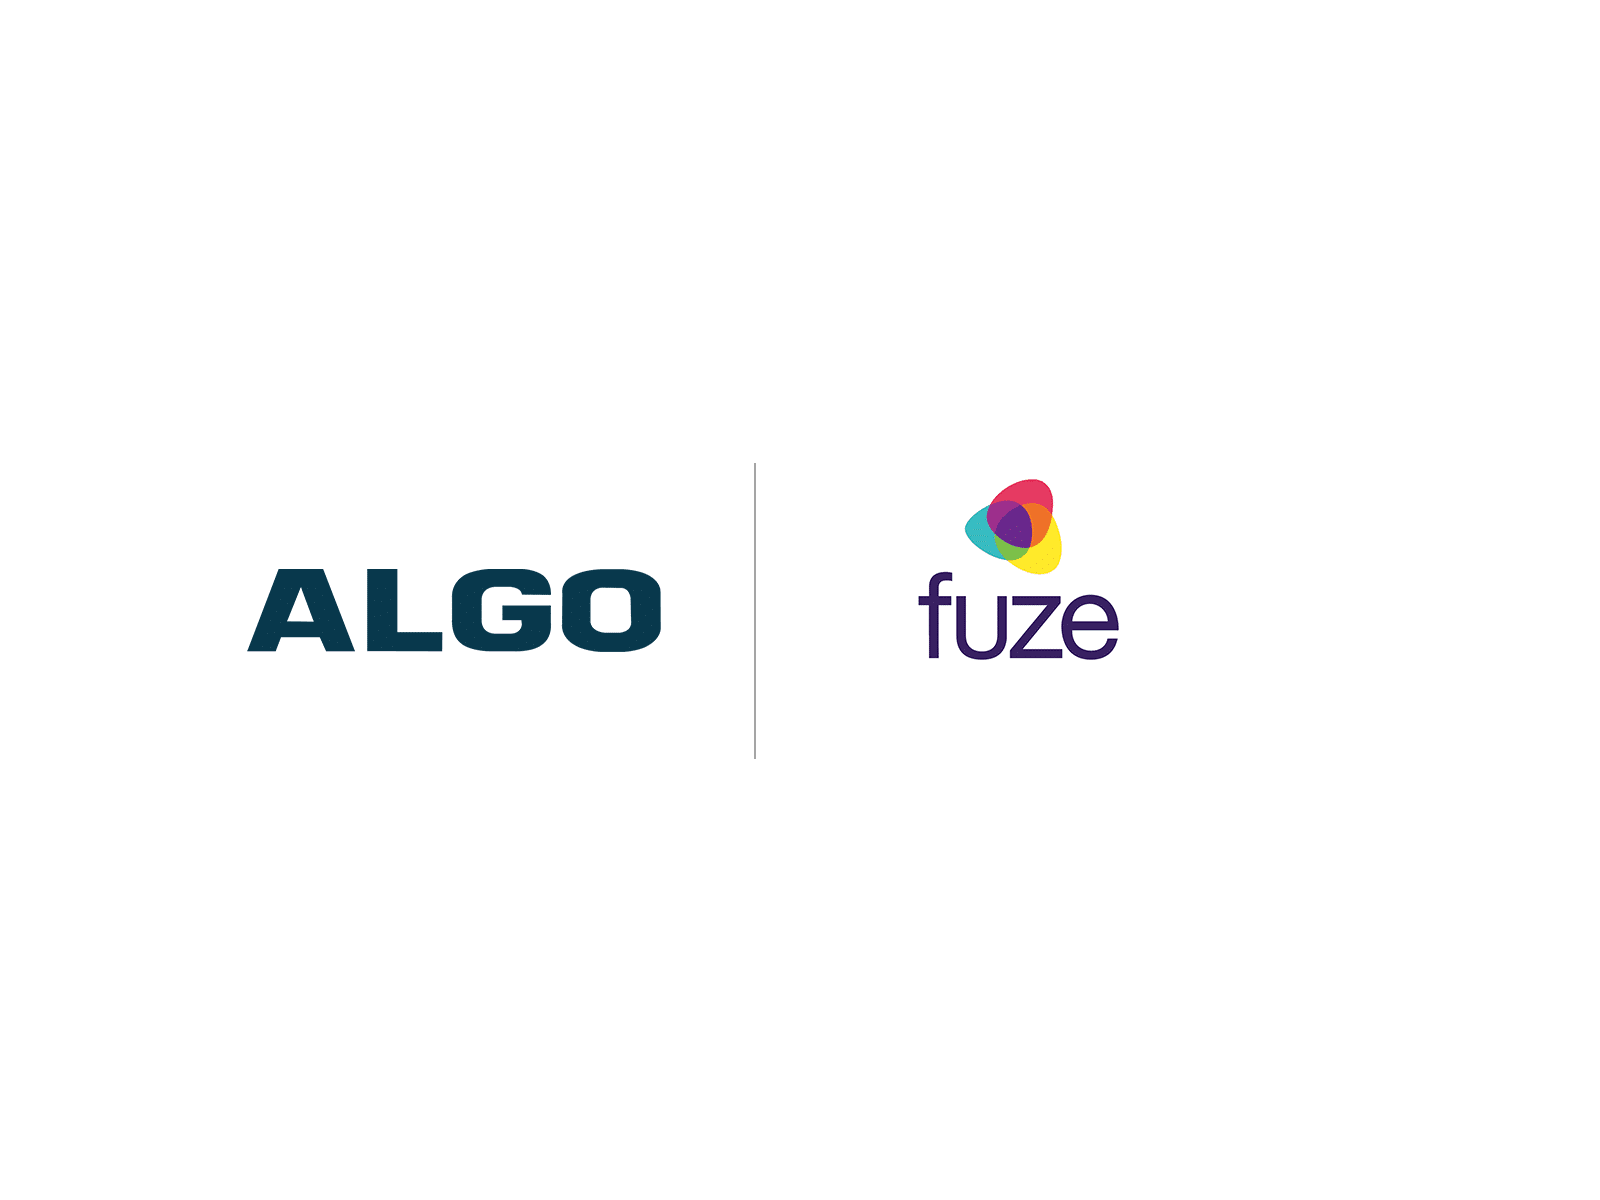 Algo Fuze Logo Compatibility